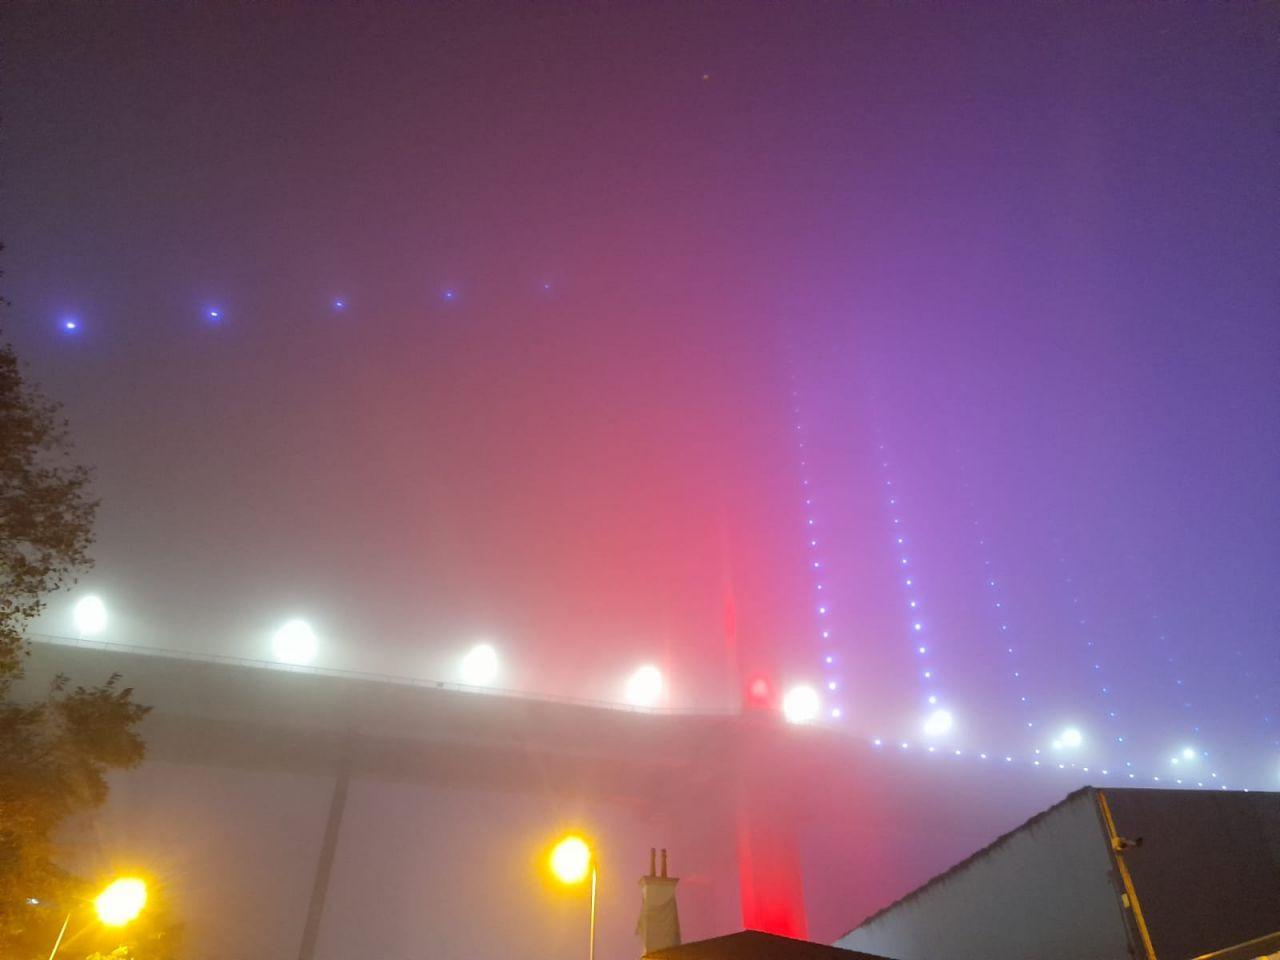 İstanbul'da sis etkili oldu - Sayfa 2